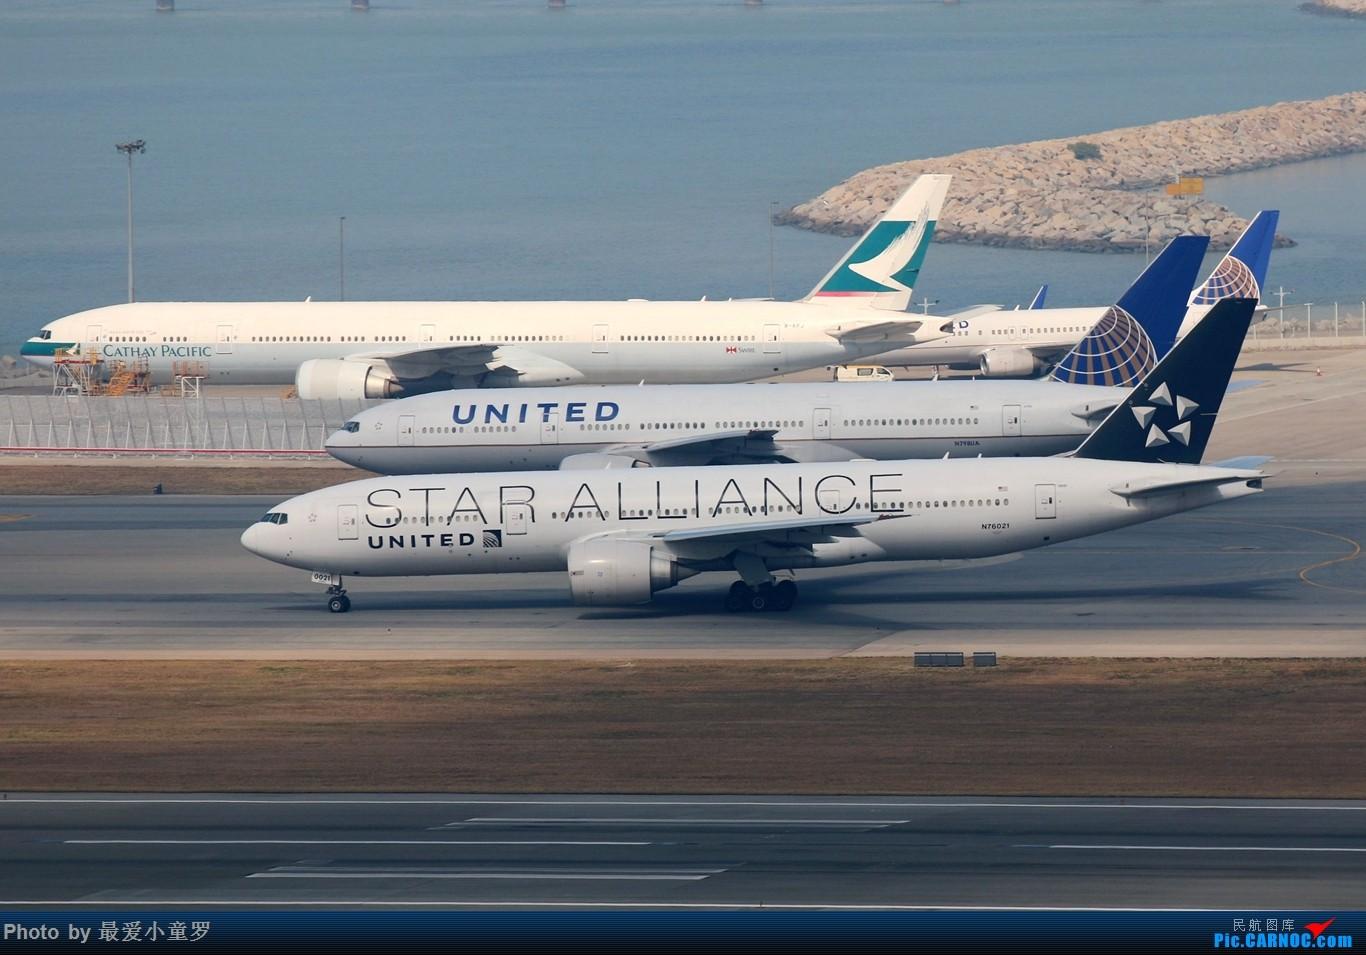 Re:[原创]2015年1月25日香港沙螺湾烂天拍机第二集——波音777 BOEING 777-200ER N76021